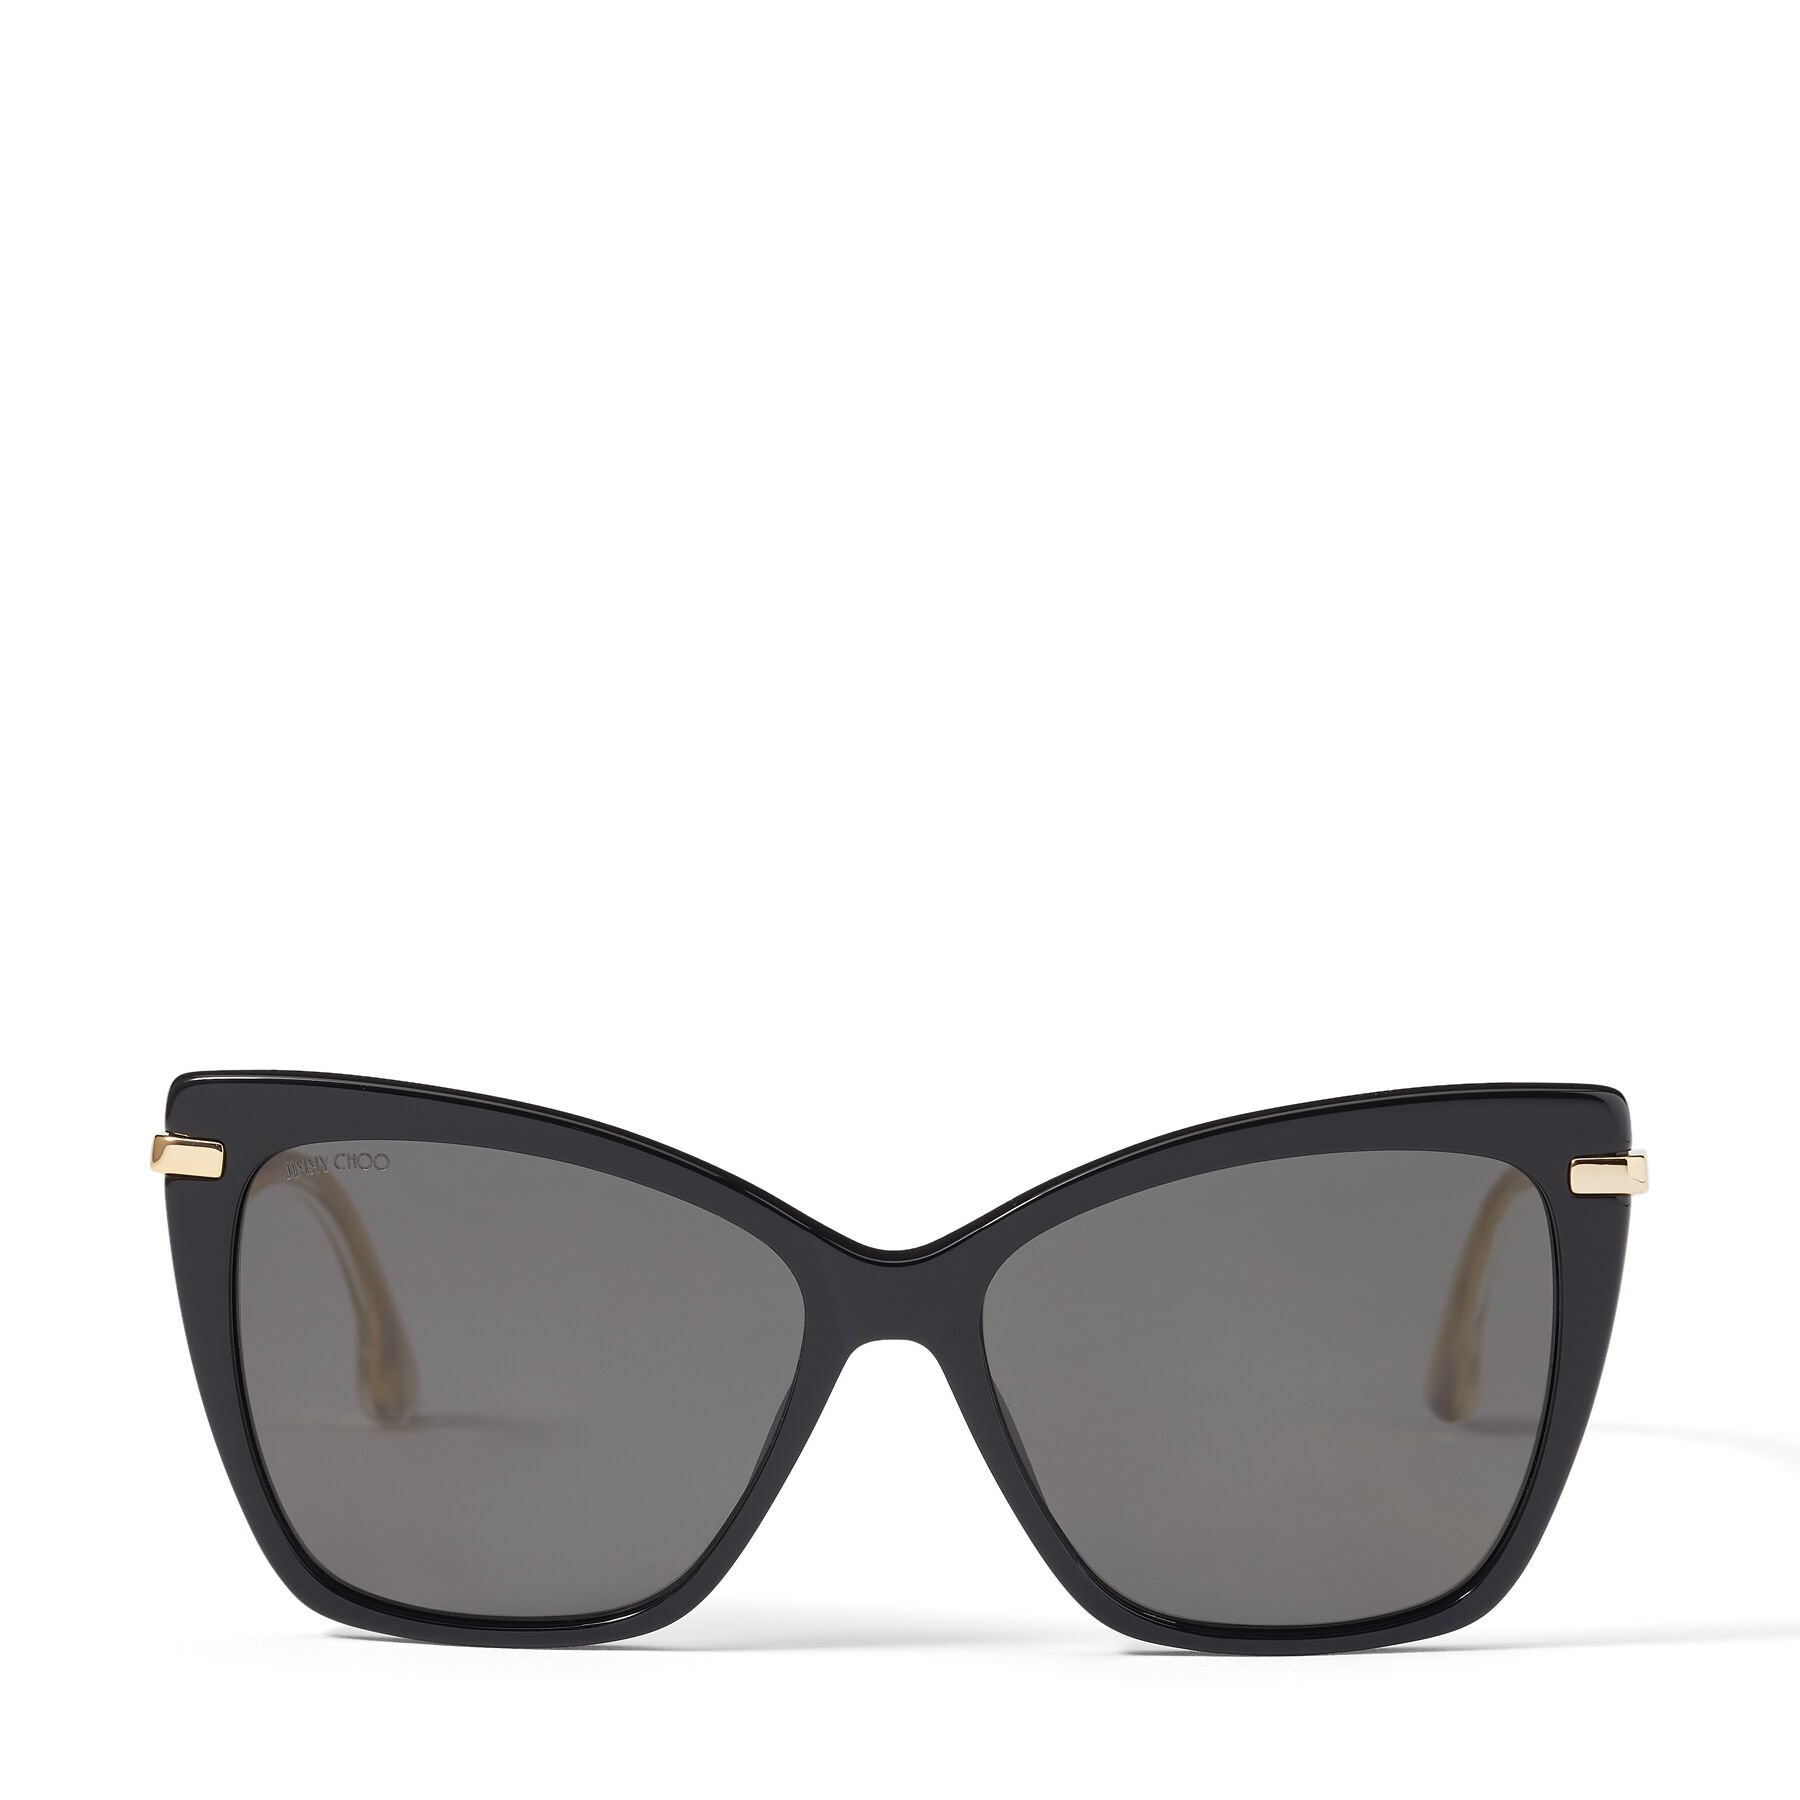 Jimmy Choo SELBY/G/S 807M9 Polarised Sunglasses - Pretavoir